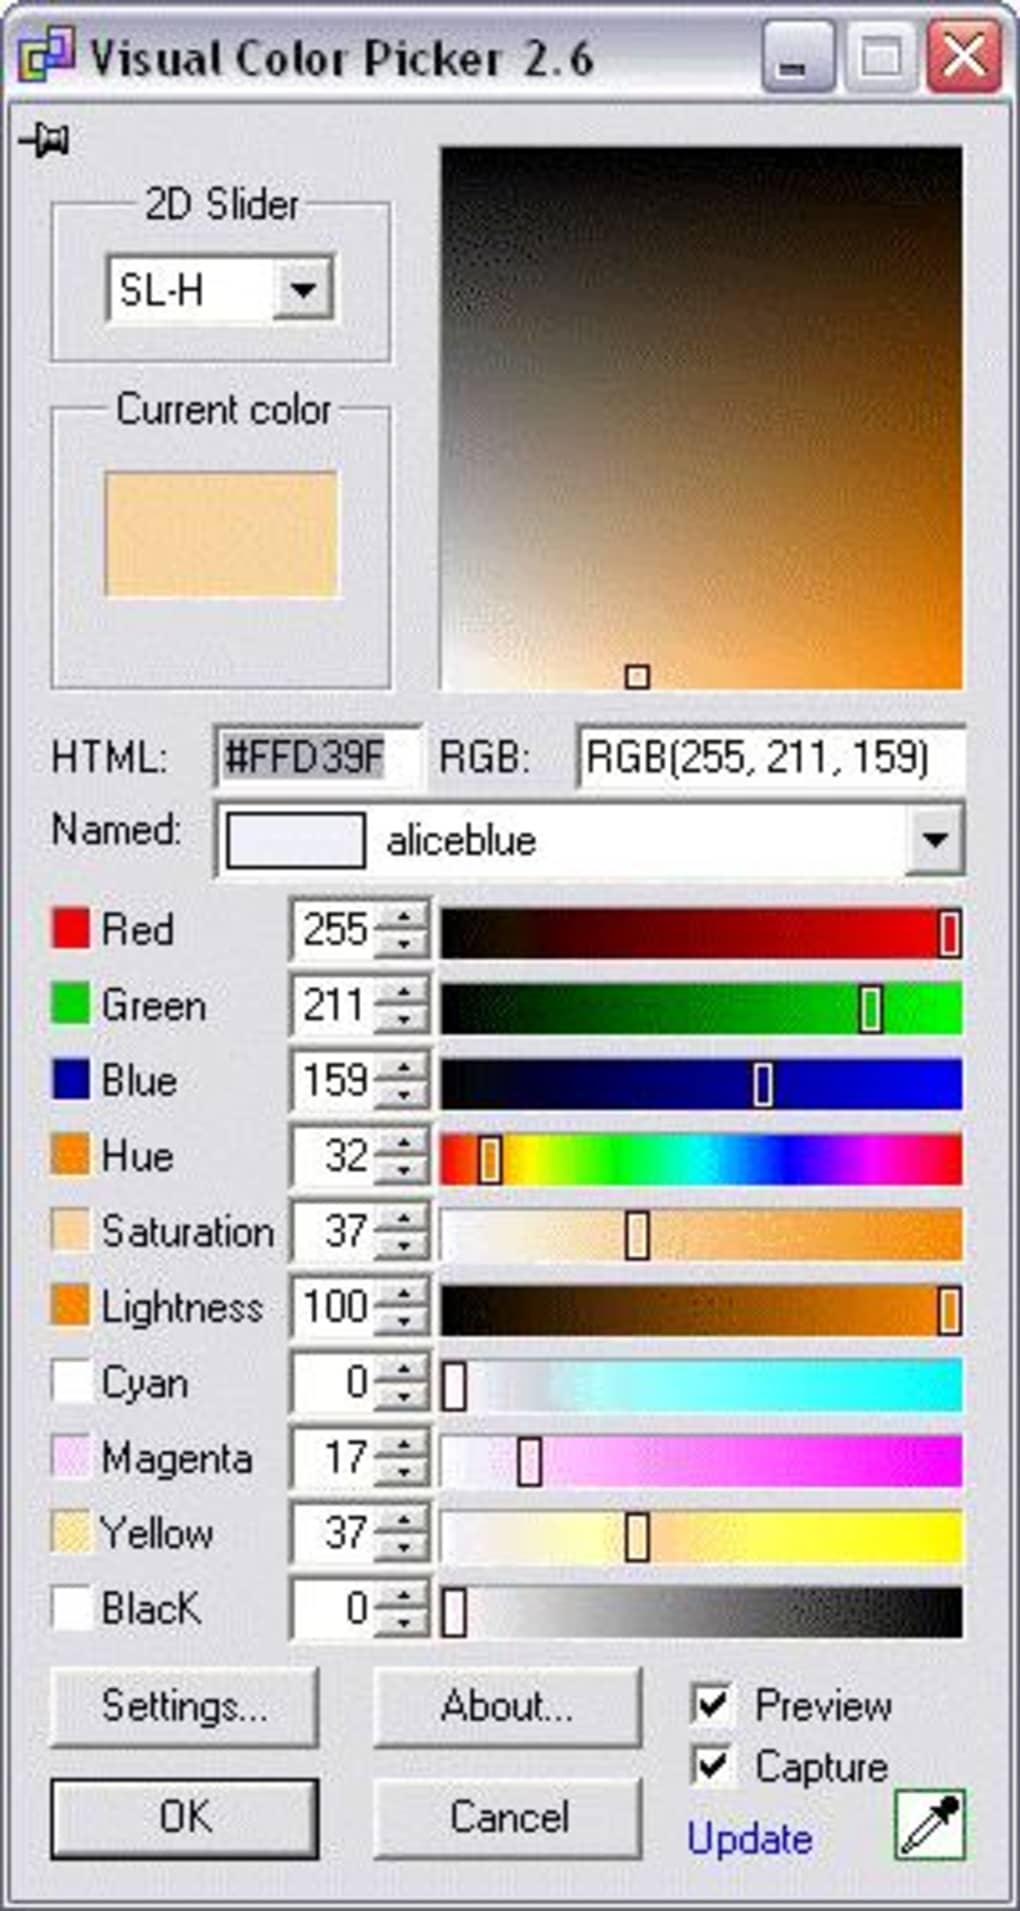 Visual Color Picker - Download